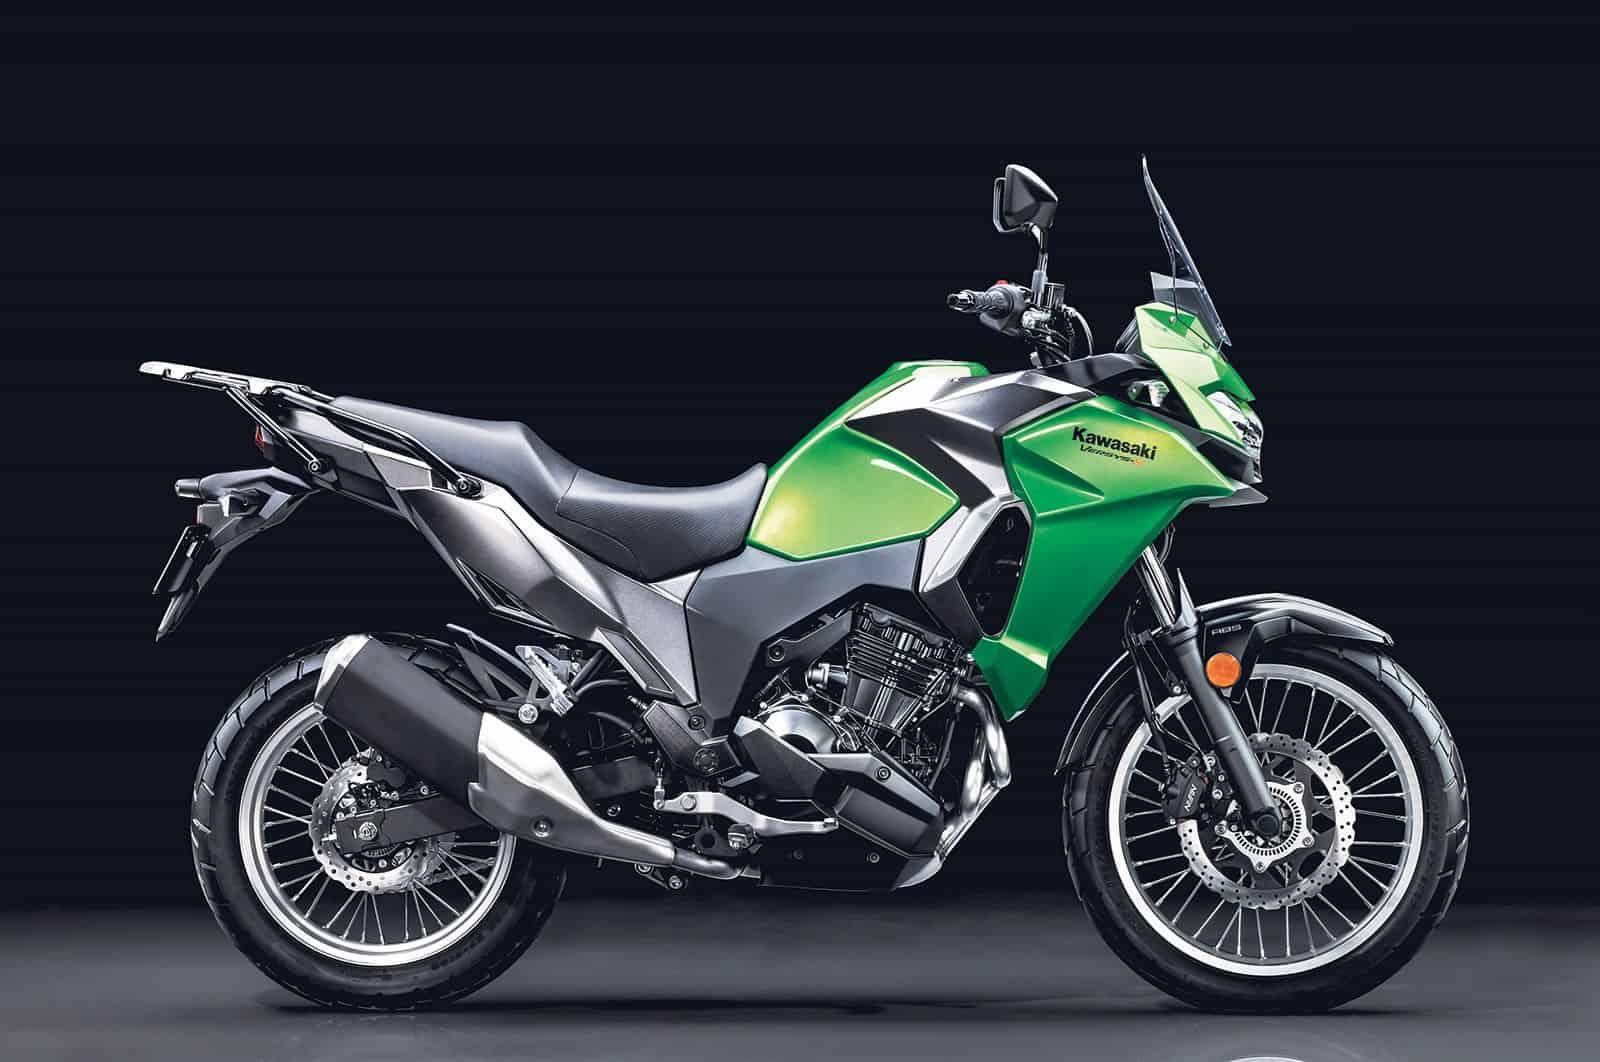 Kawasaki Versys-X 300 – commuter motorcycle